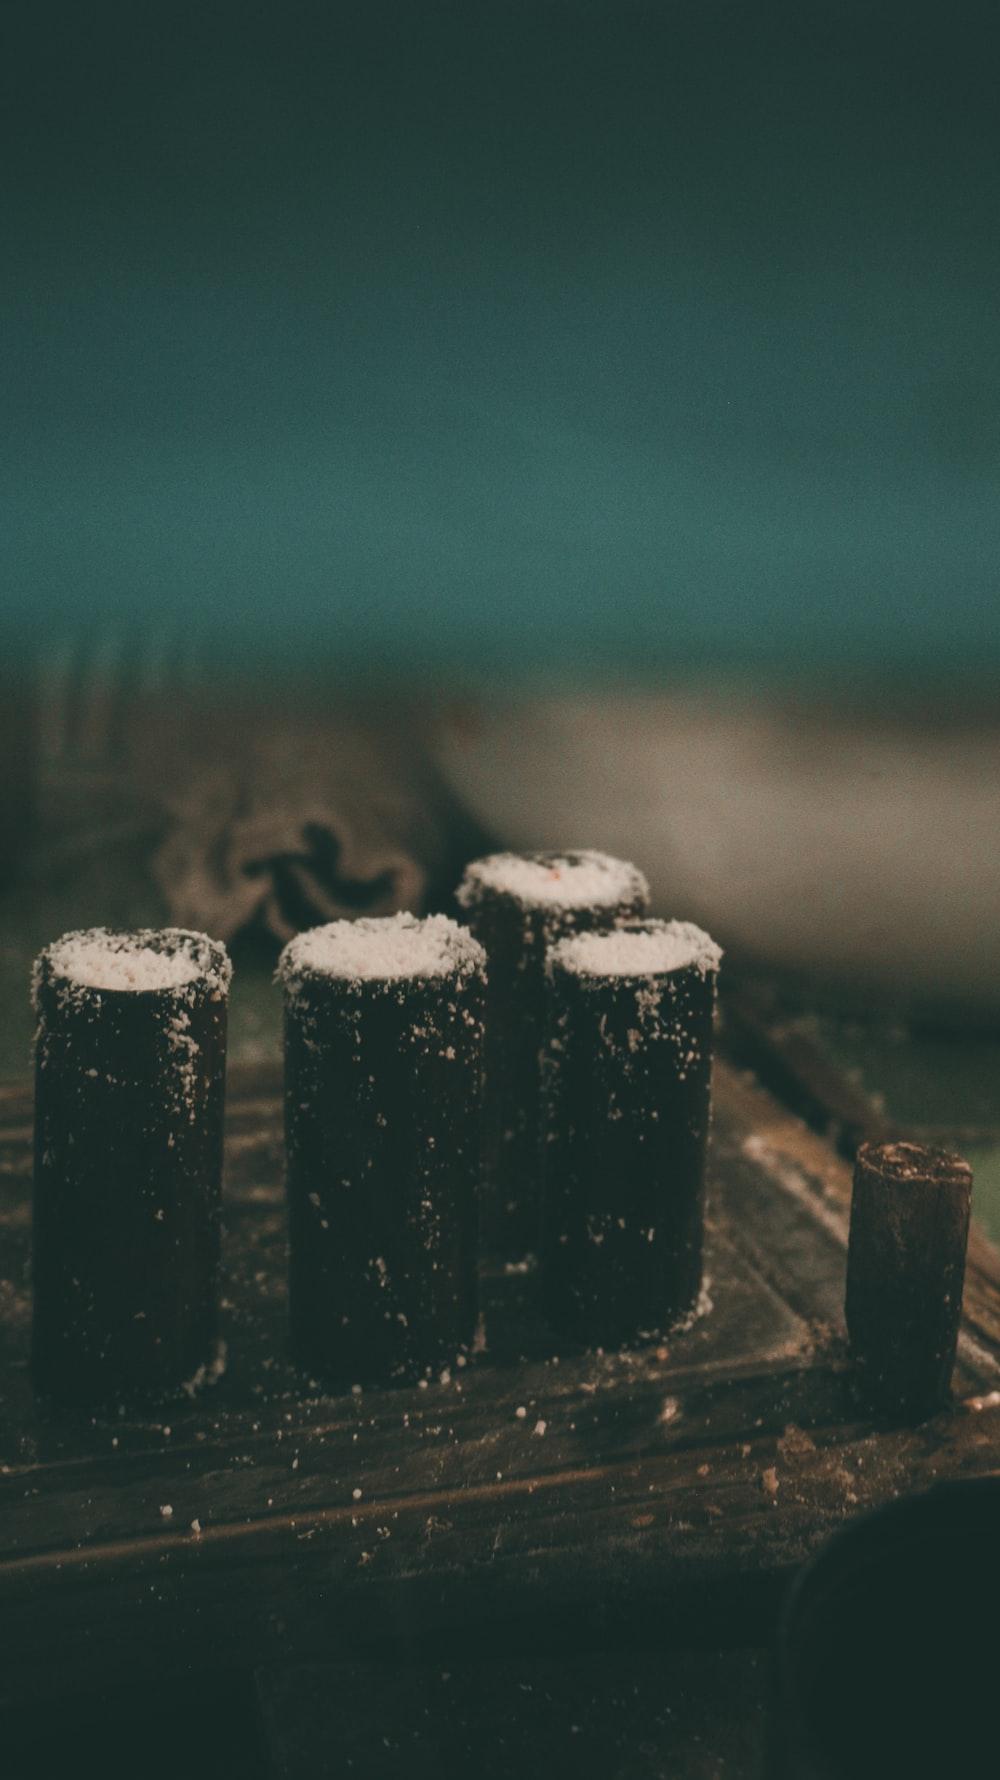 black wooden decor at night